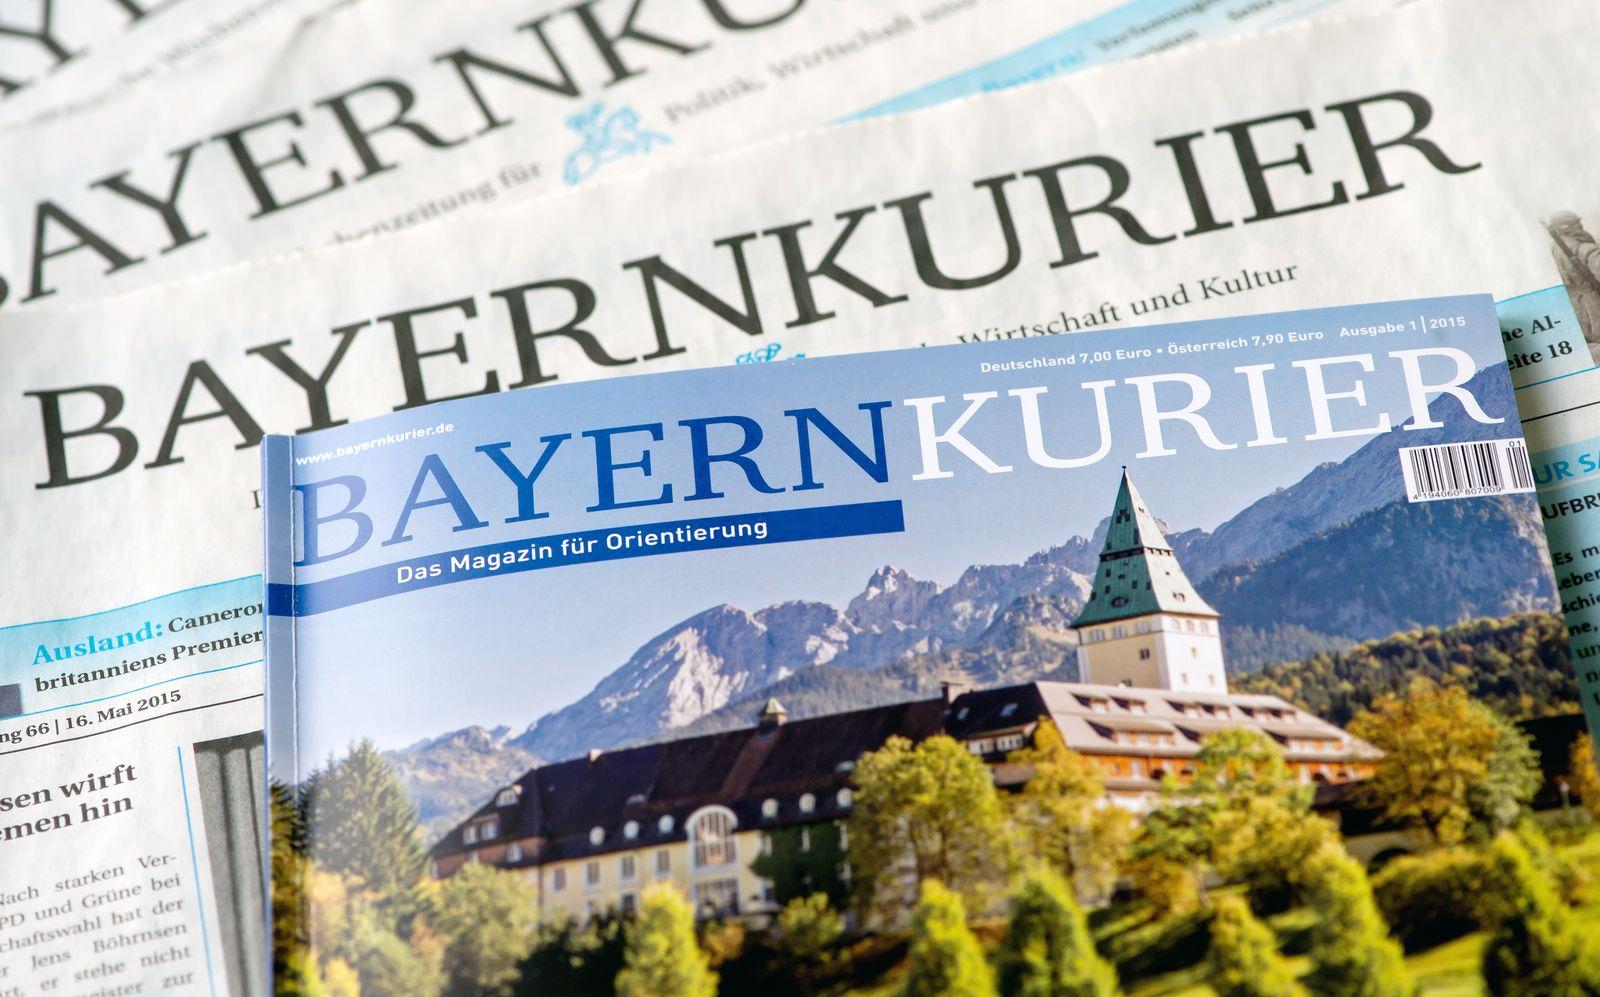 Bayernkurier